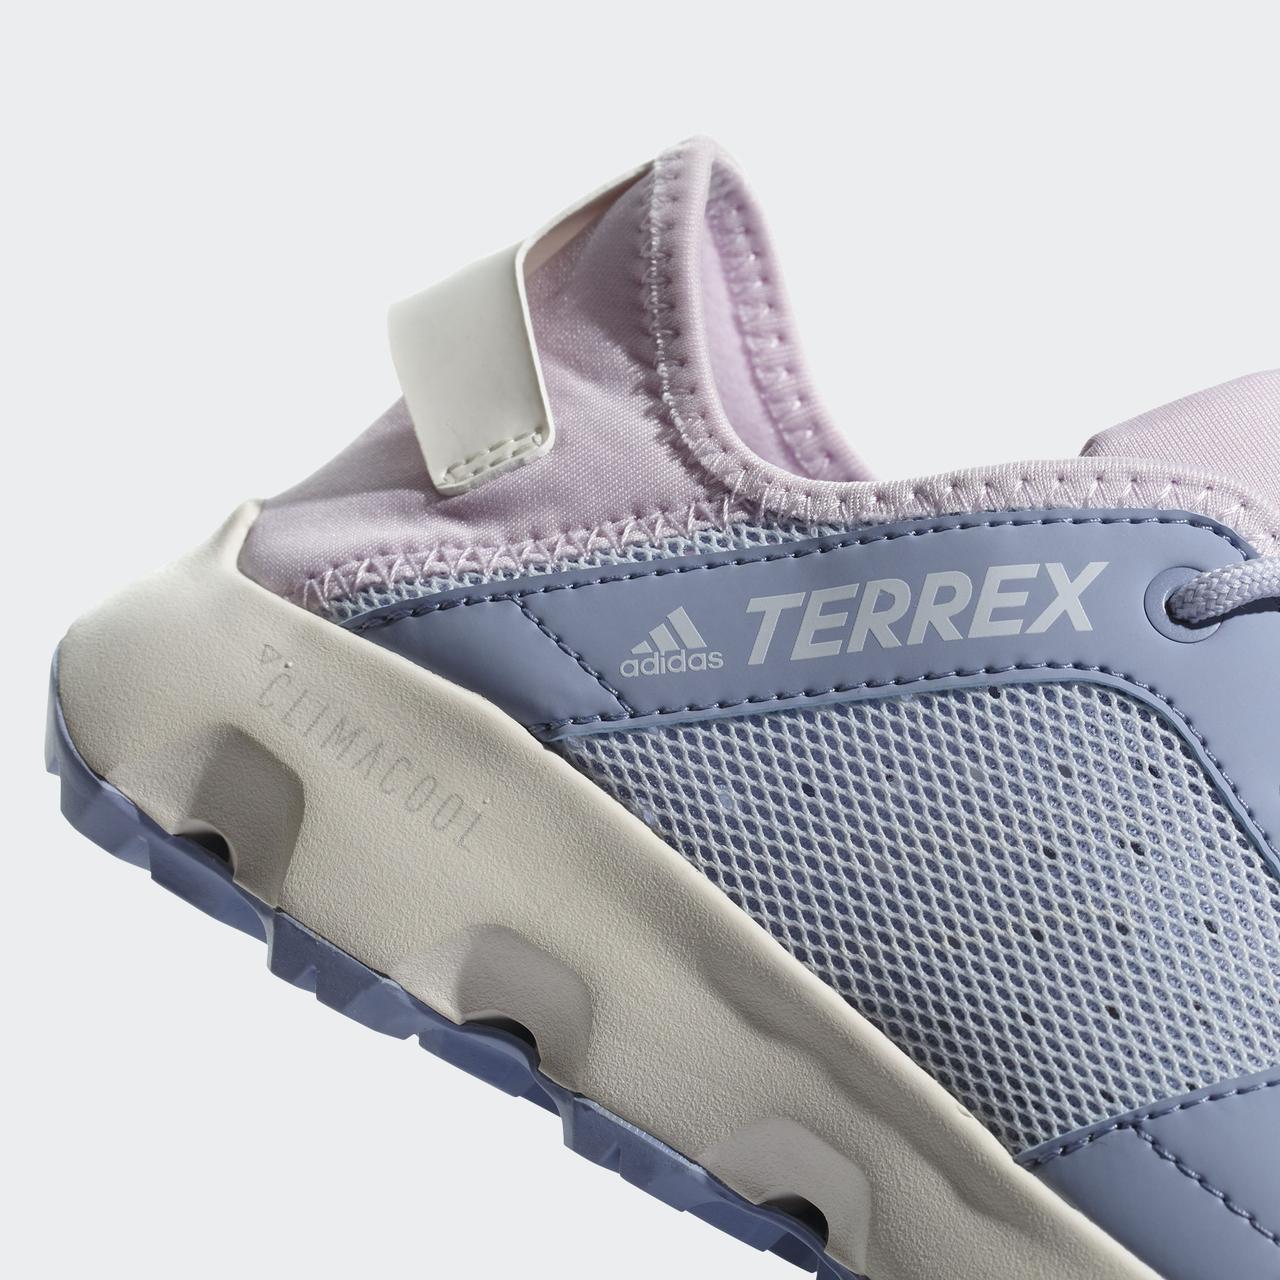 e83d948d ... Женские кроссовки Adidas Performance Terrex CC Voyager Sleek (Артикул:  CM7543), фото 10